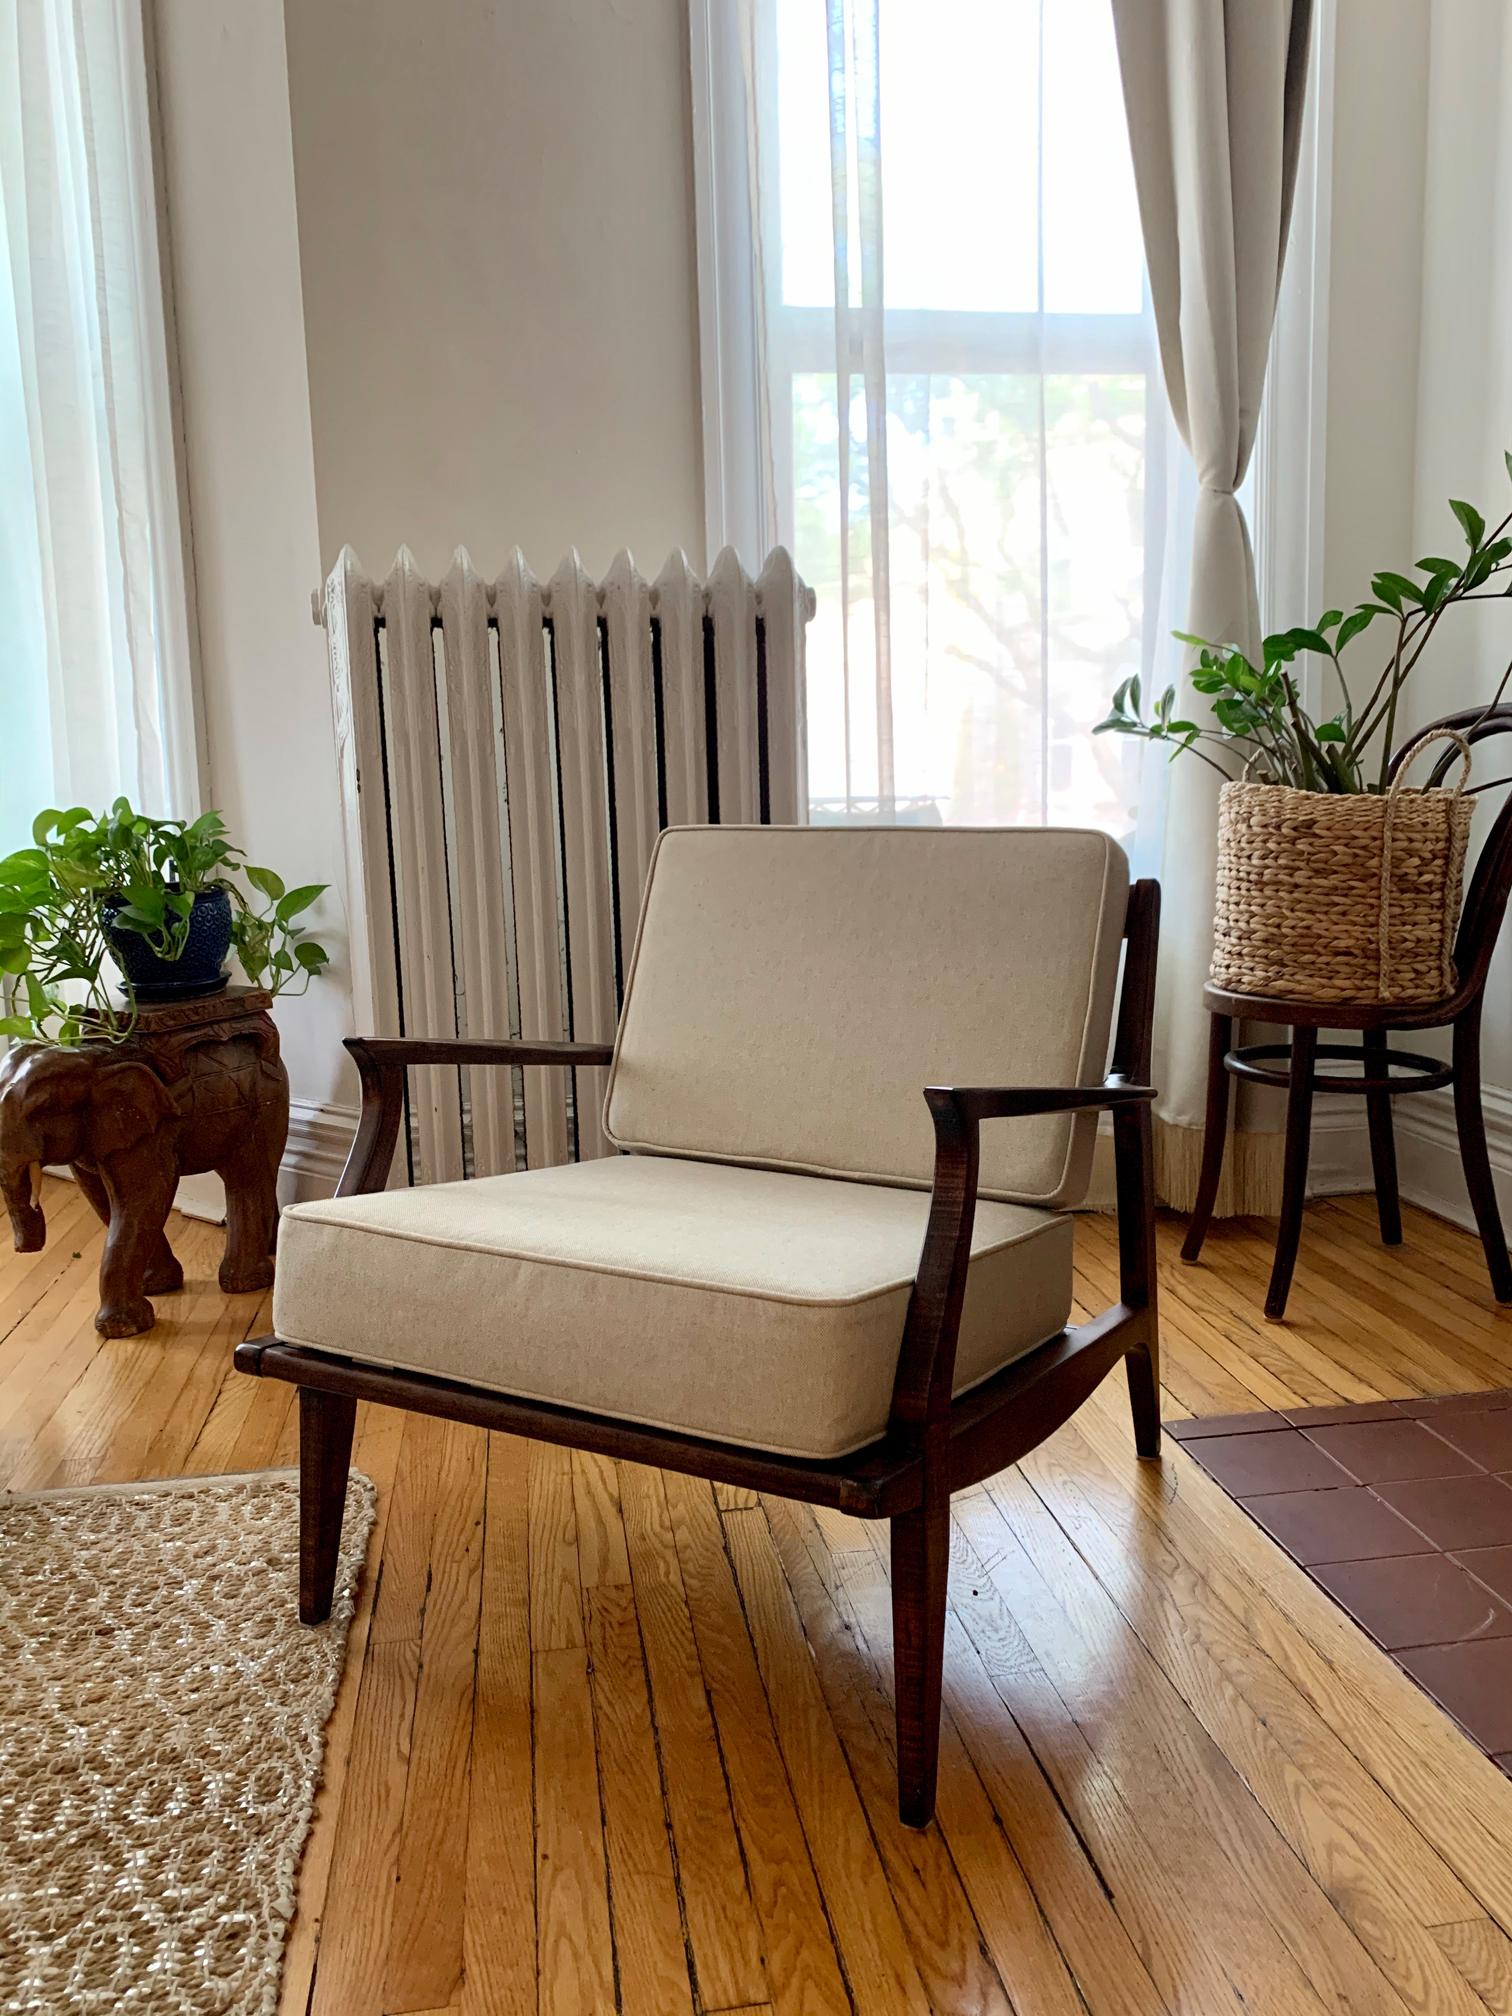 Cushions for danish chair